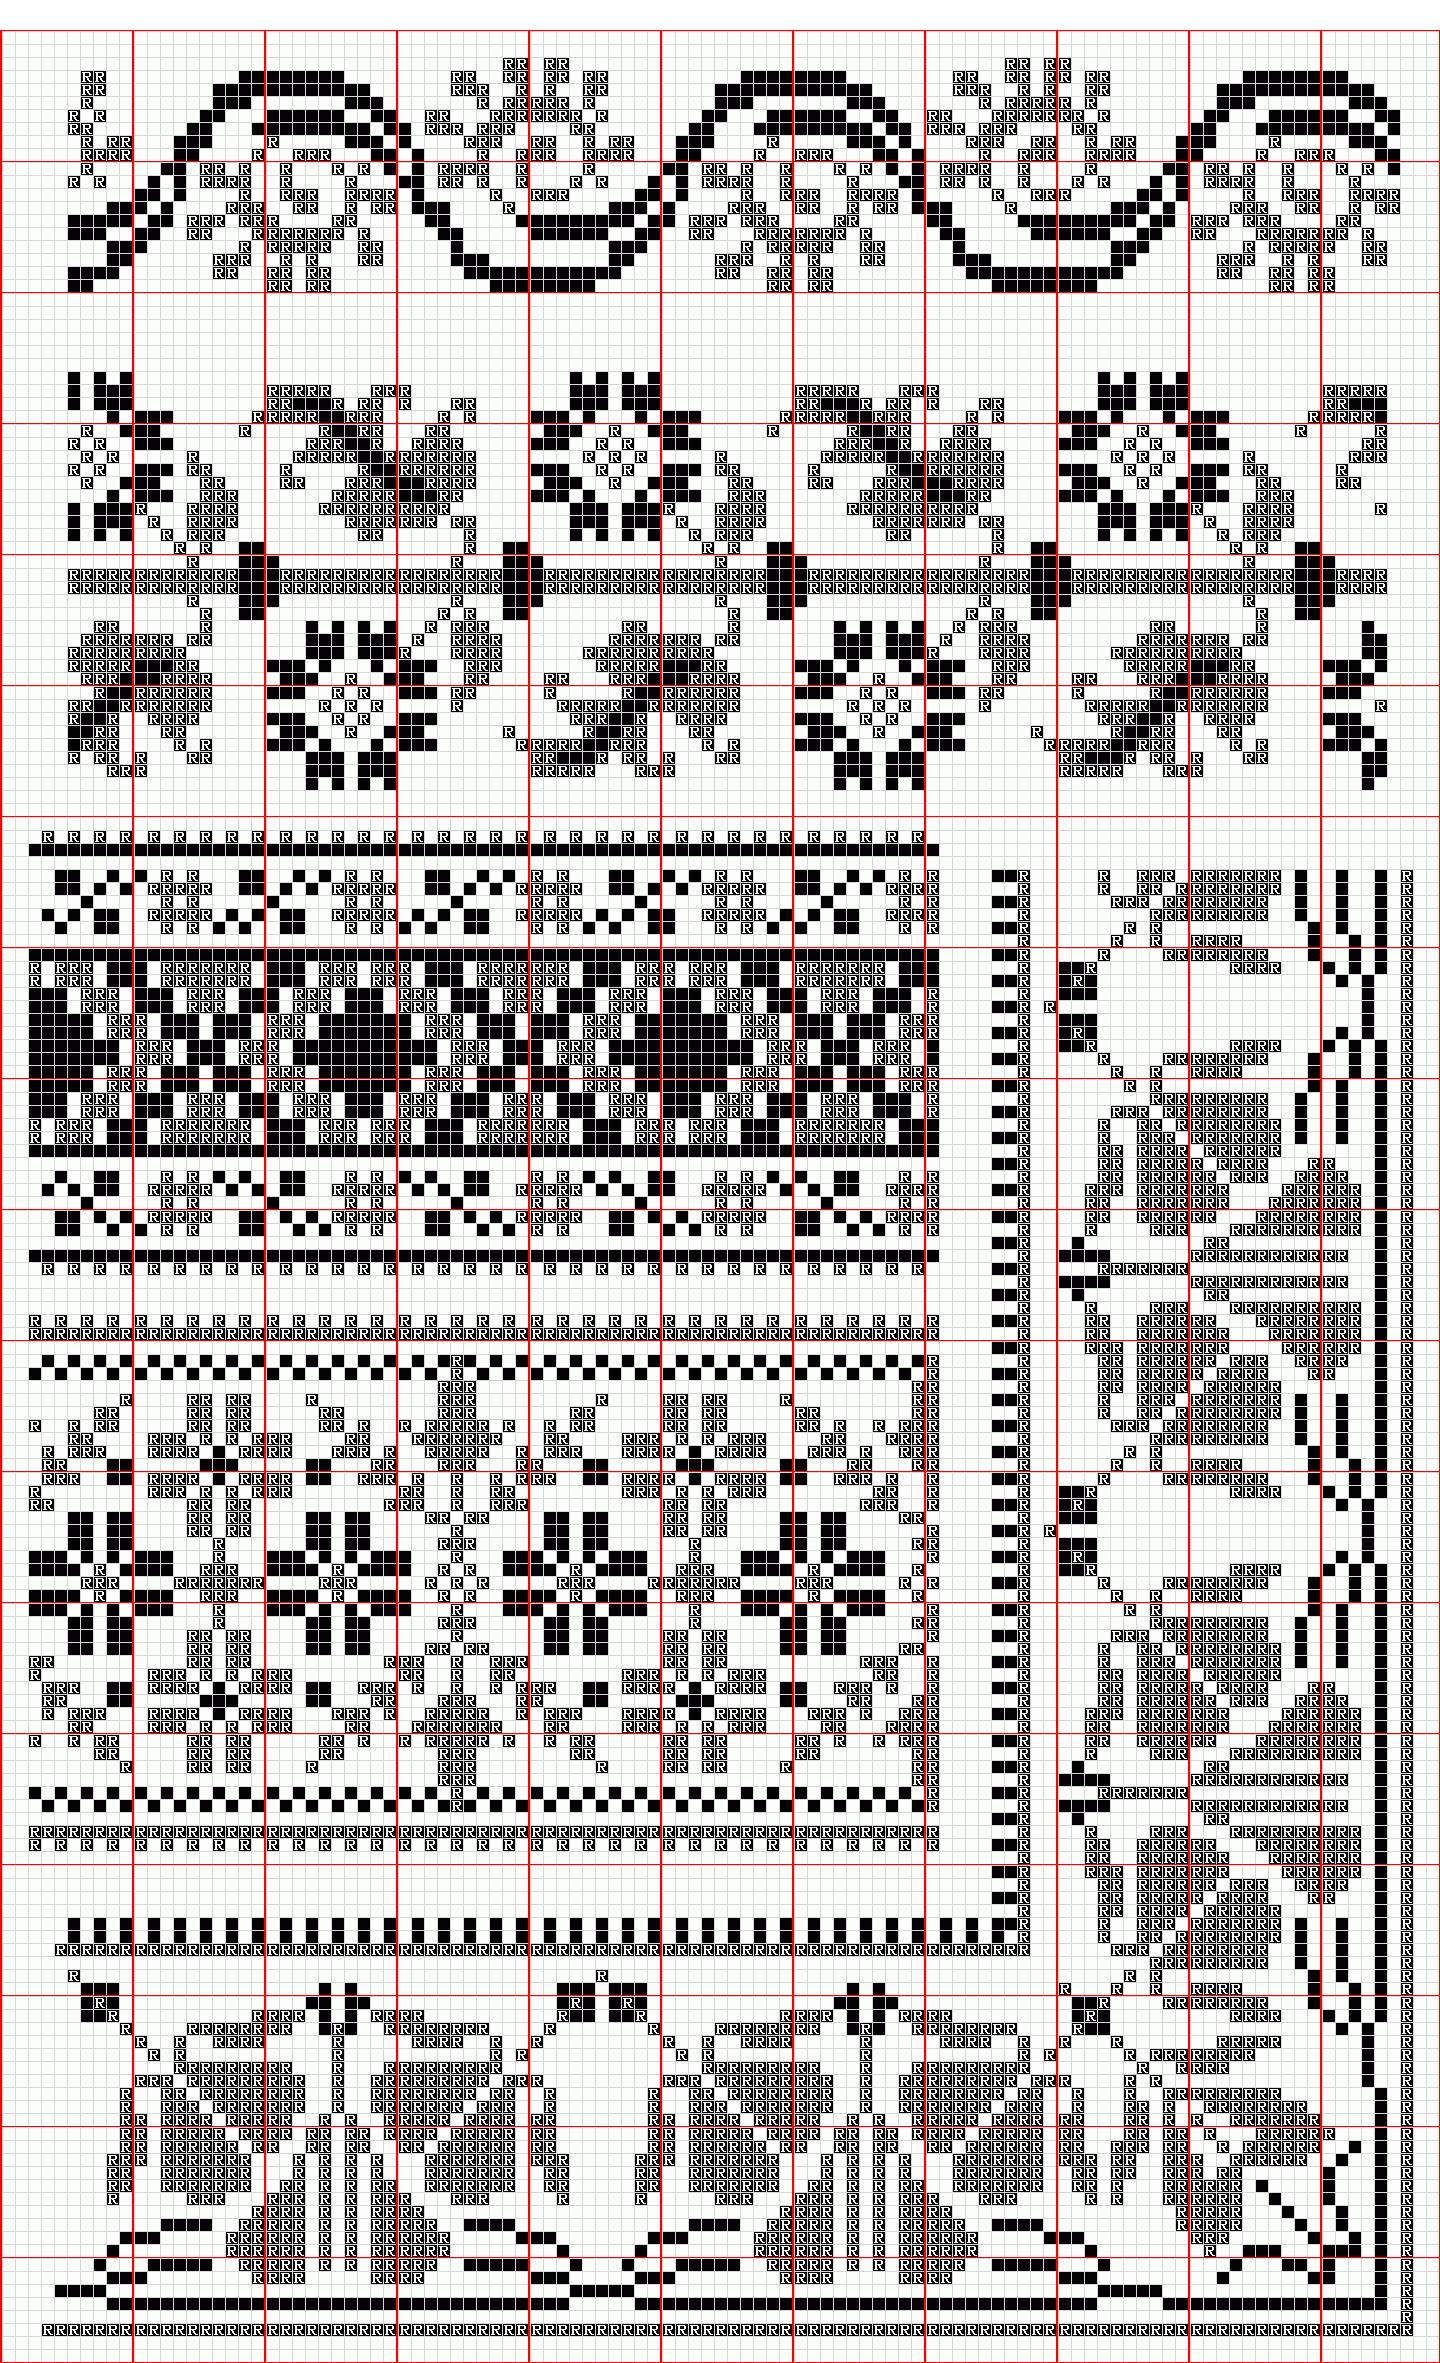 158-162-2.png 1,440×2,363 pixels | national 1 | Pinterest | Punto de ...